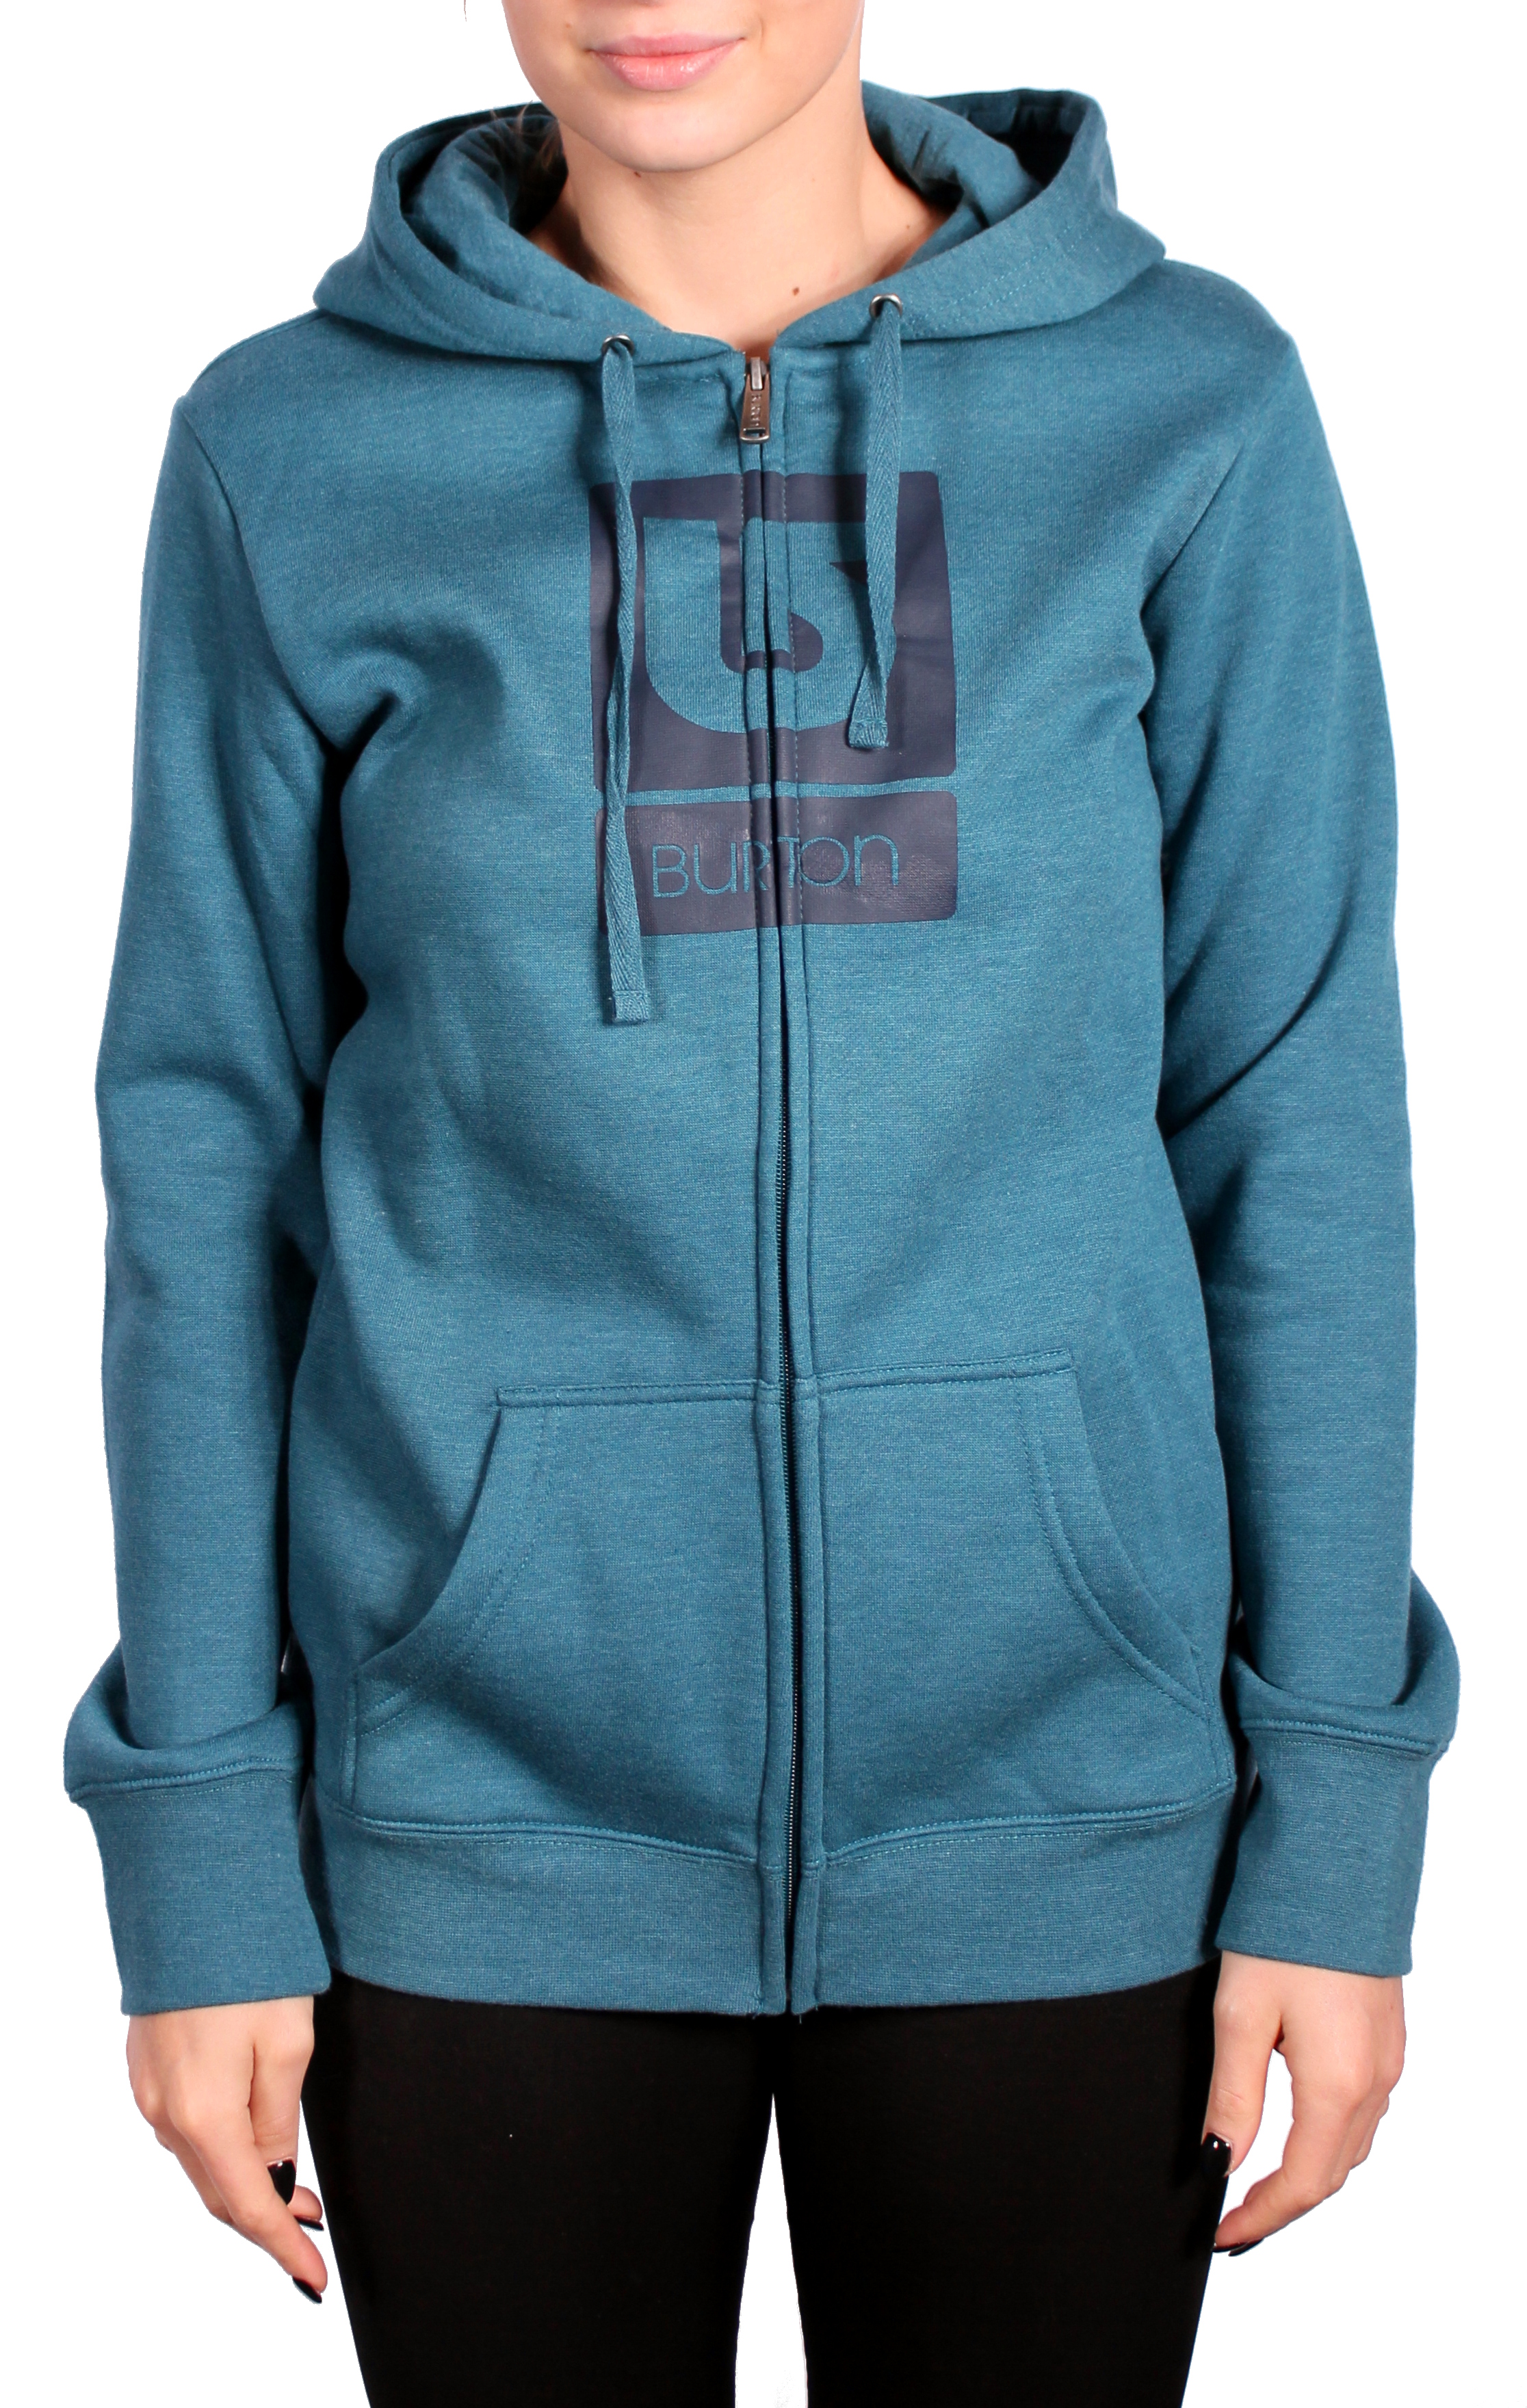 Bluza Burton Wms Rpet Logo Vertical (Heather Cerulean)